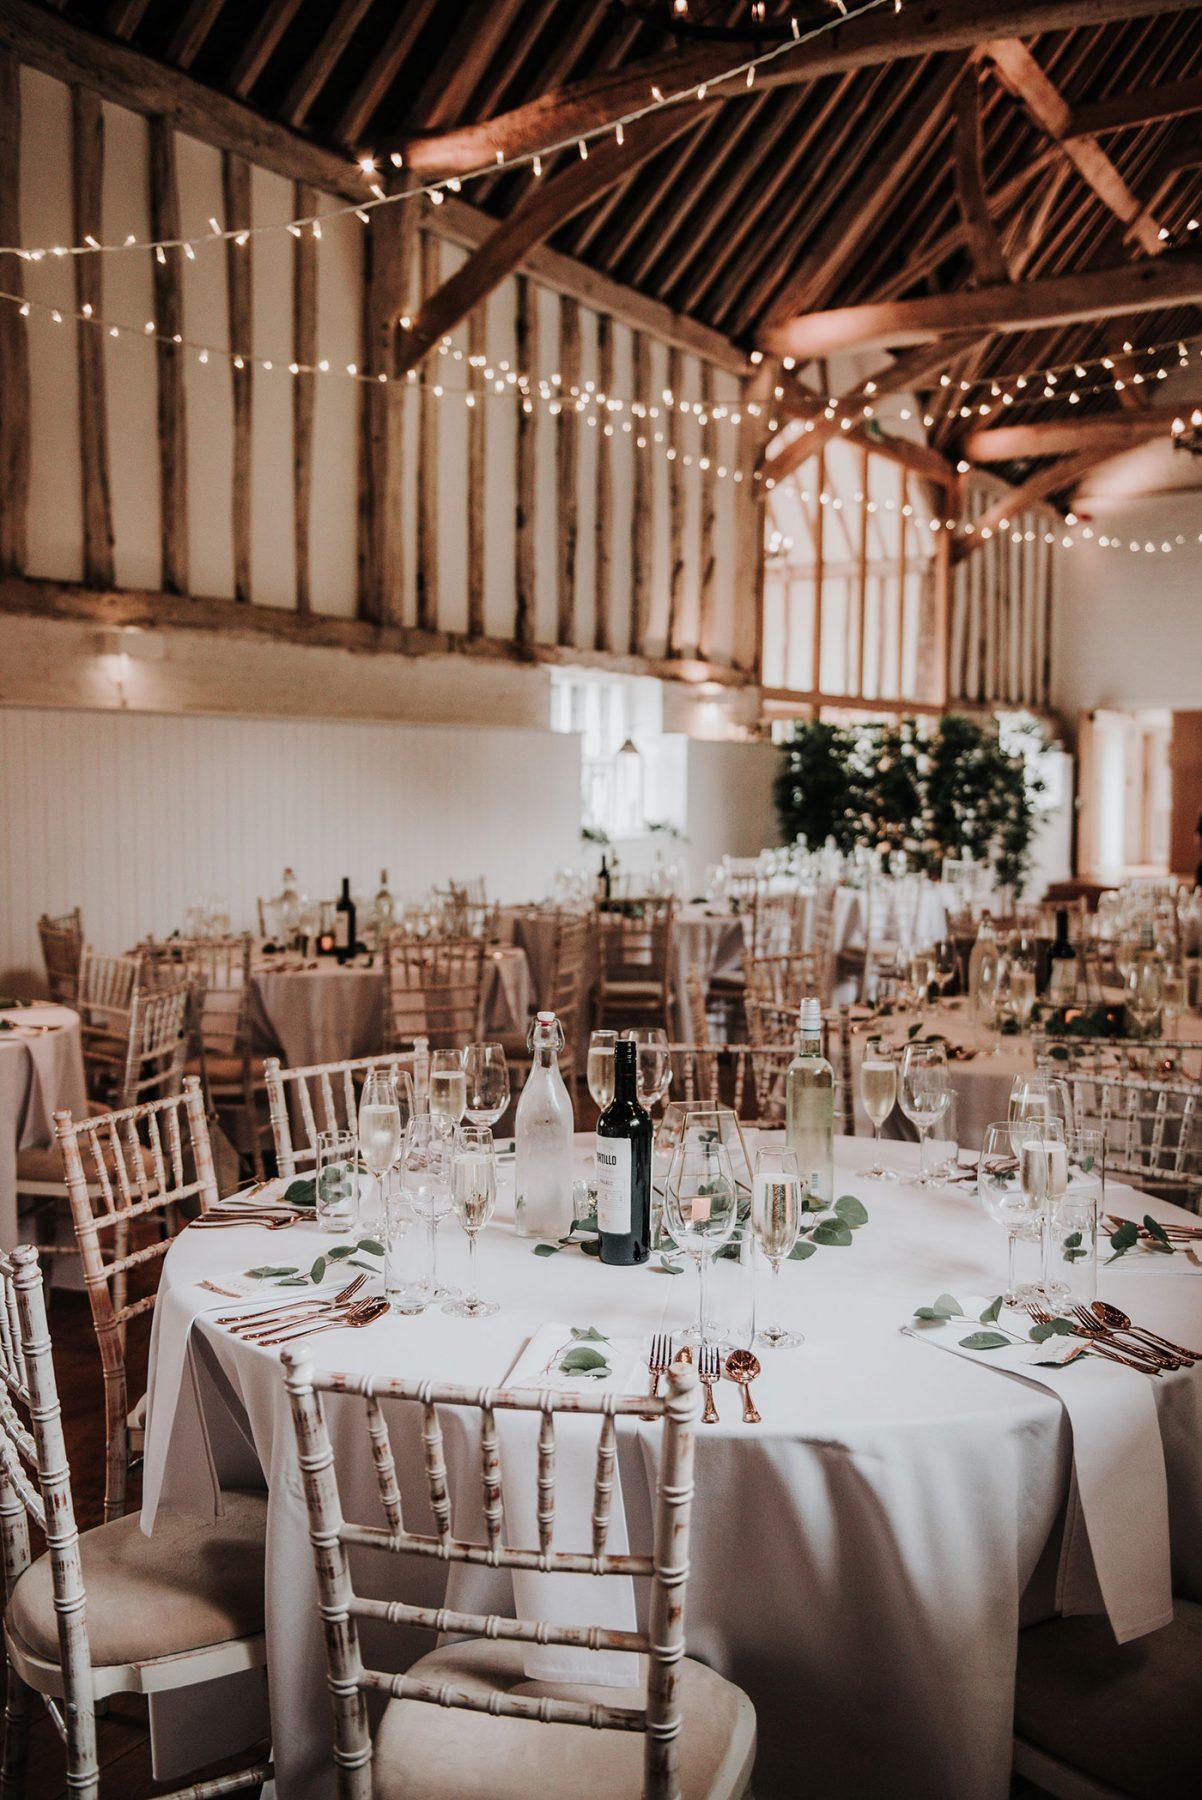 The Barn at Alswick Wedding Venue